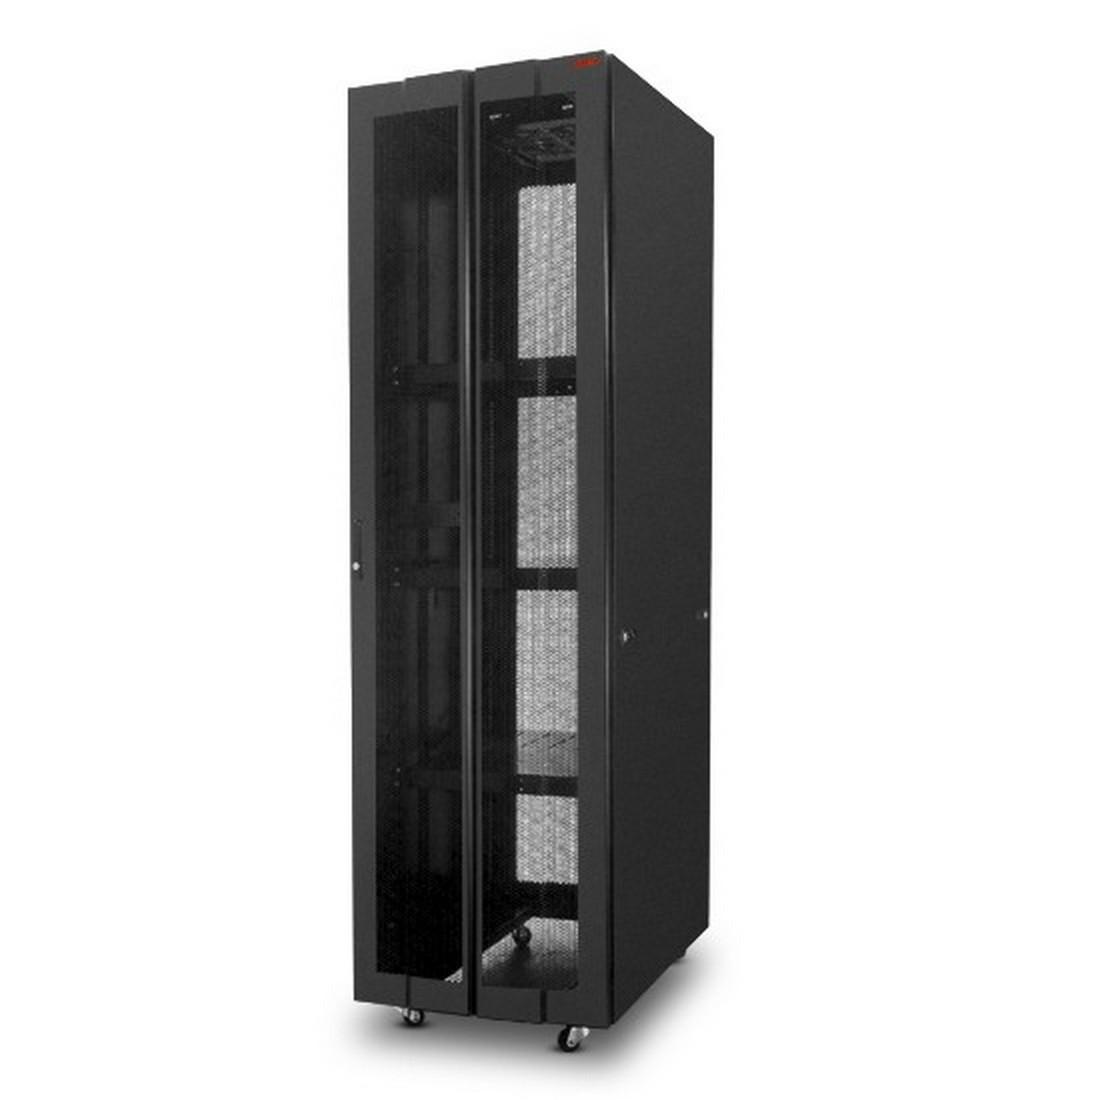 Шкаф серверный Ship 601S.6842.65.100 19'' 42U, 600*800*2000 мм